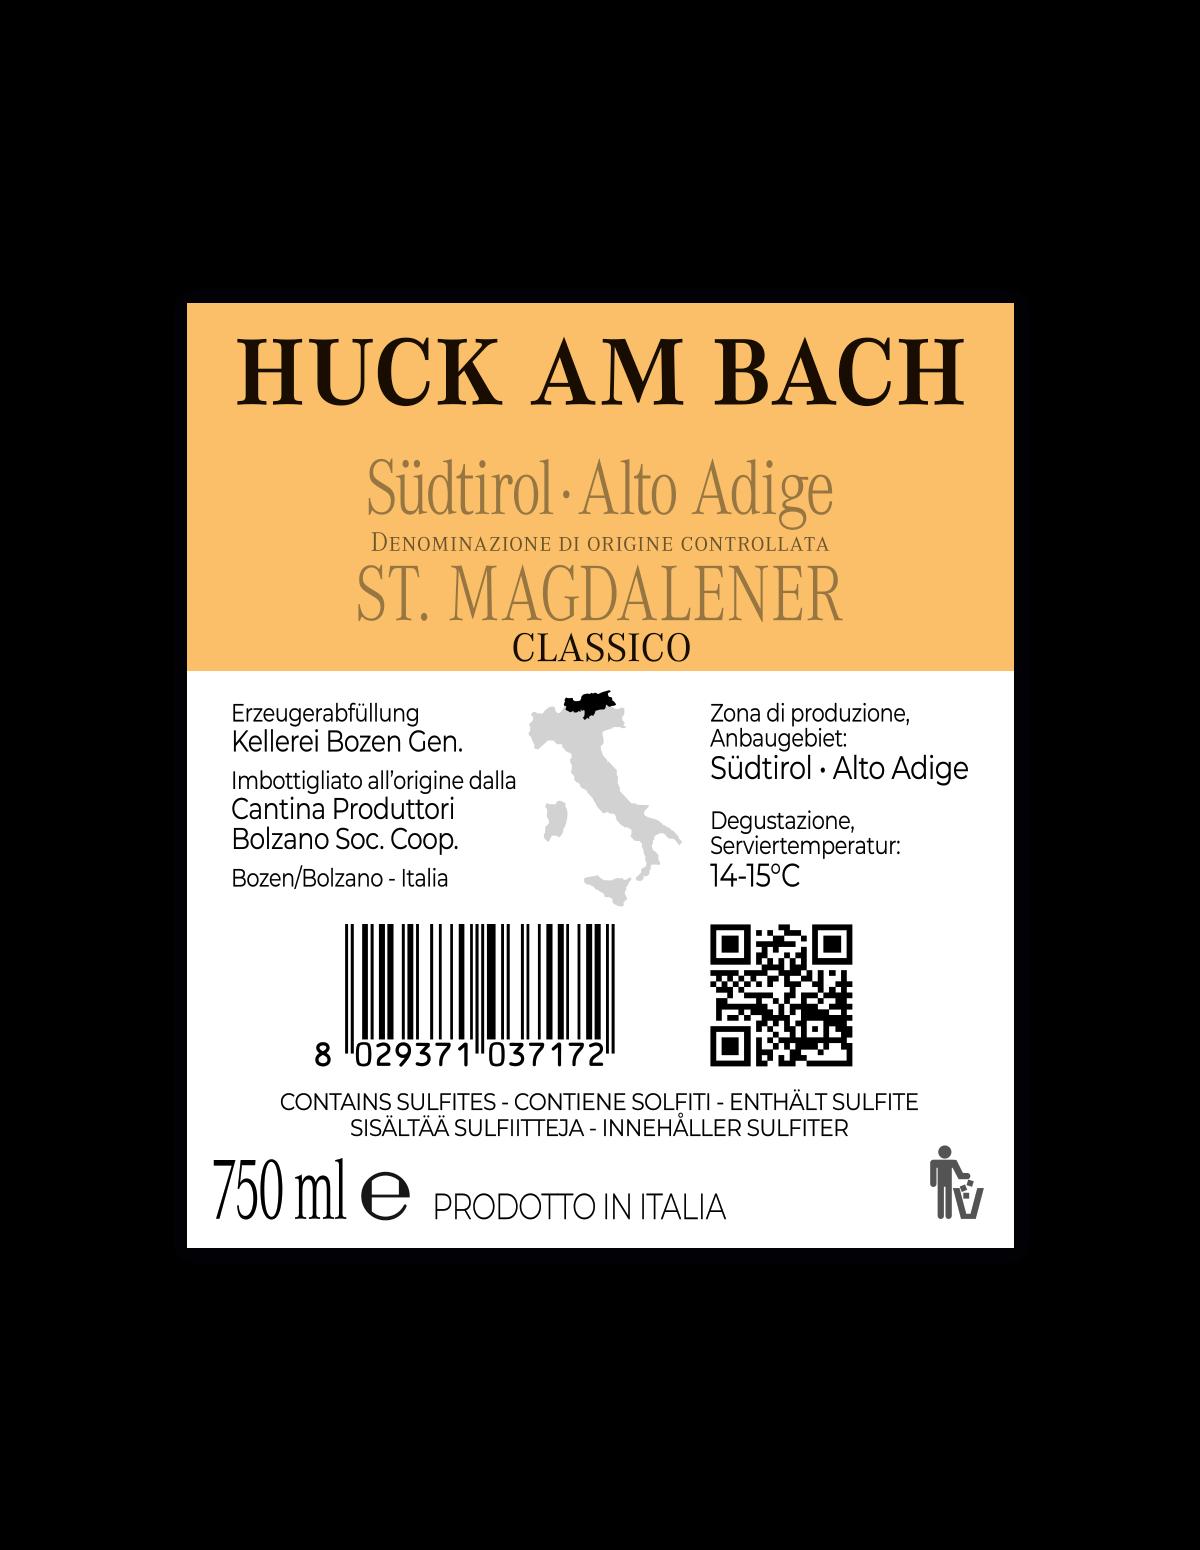 HUCK AM BACH ST. MAGDALENER CLASSICO Südtirol • Alto Adige DOC 2019